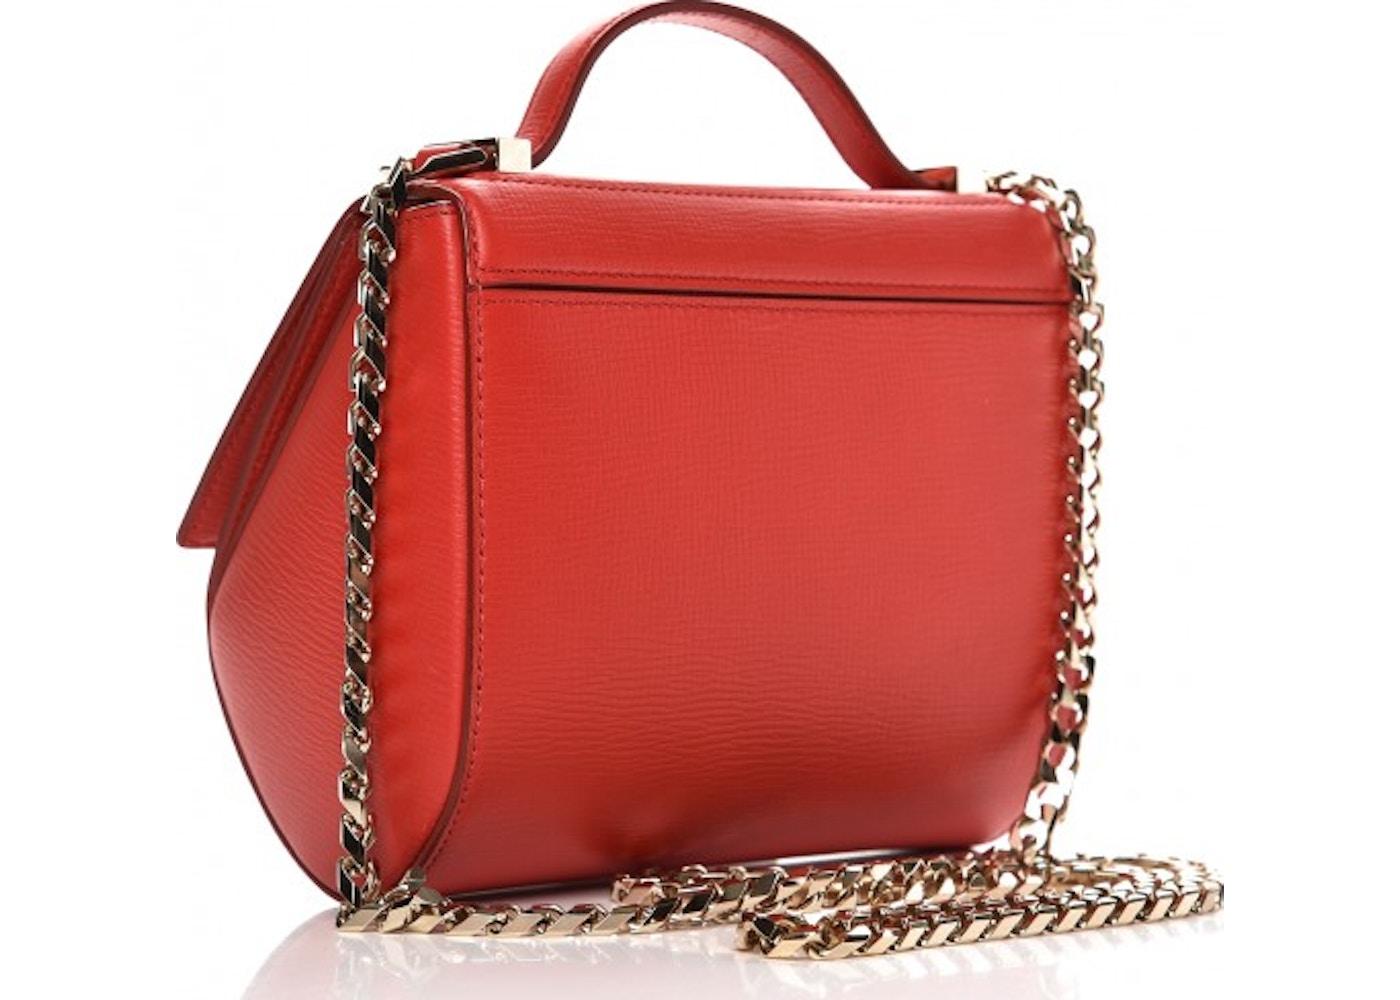 0490c941c38 Givenchy Pandora Box Crossbody Chain Textured Mini Medium Red